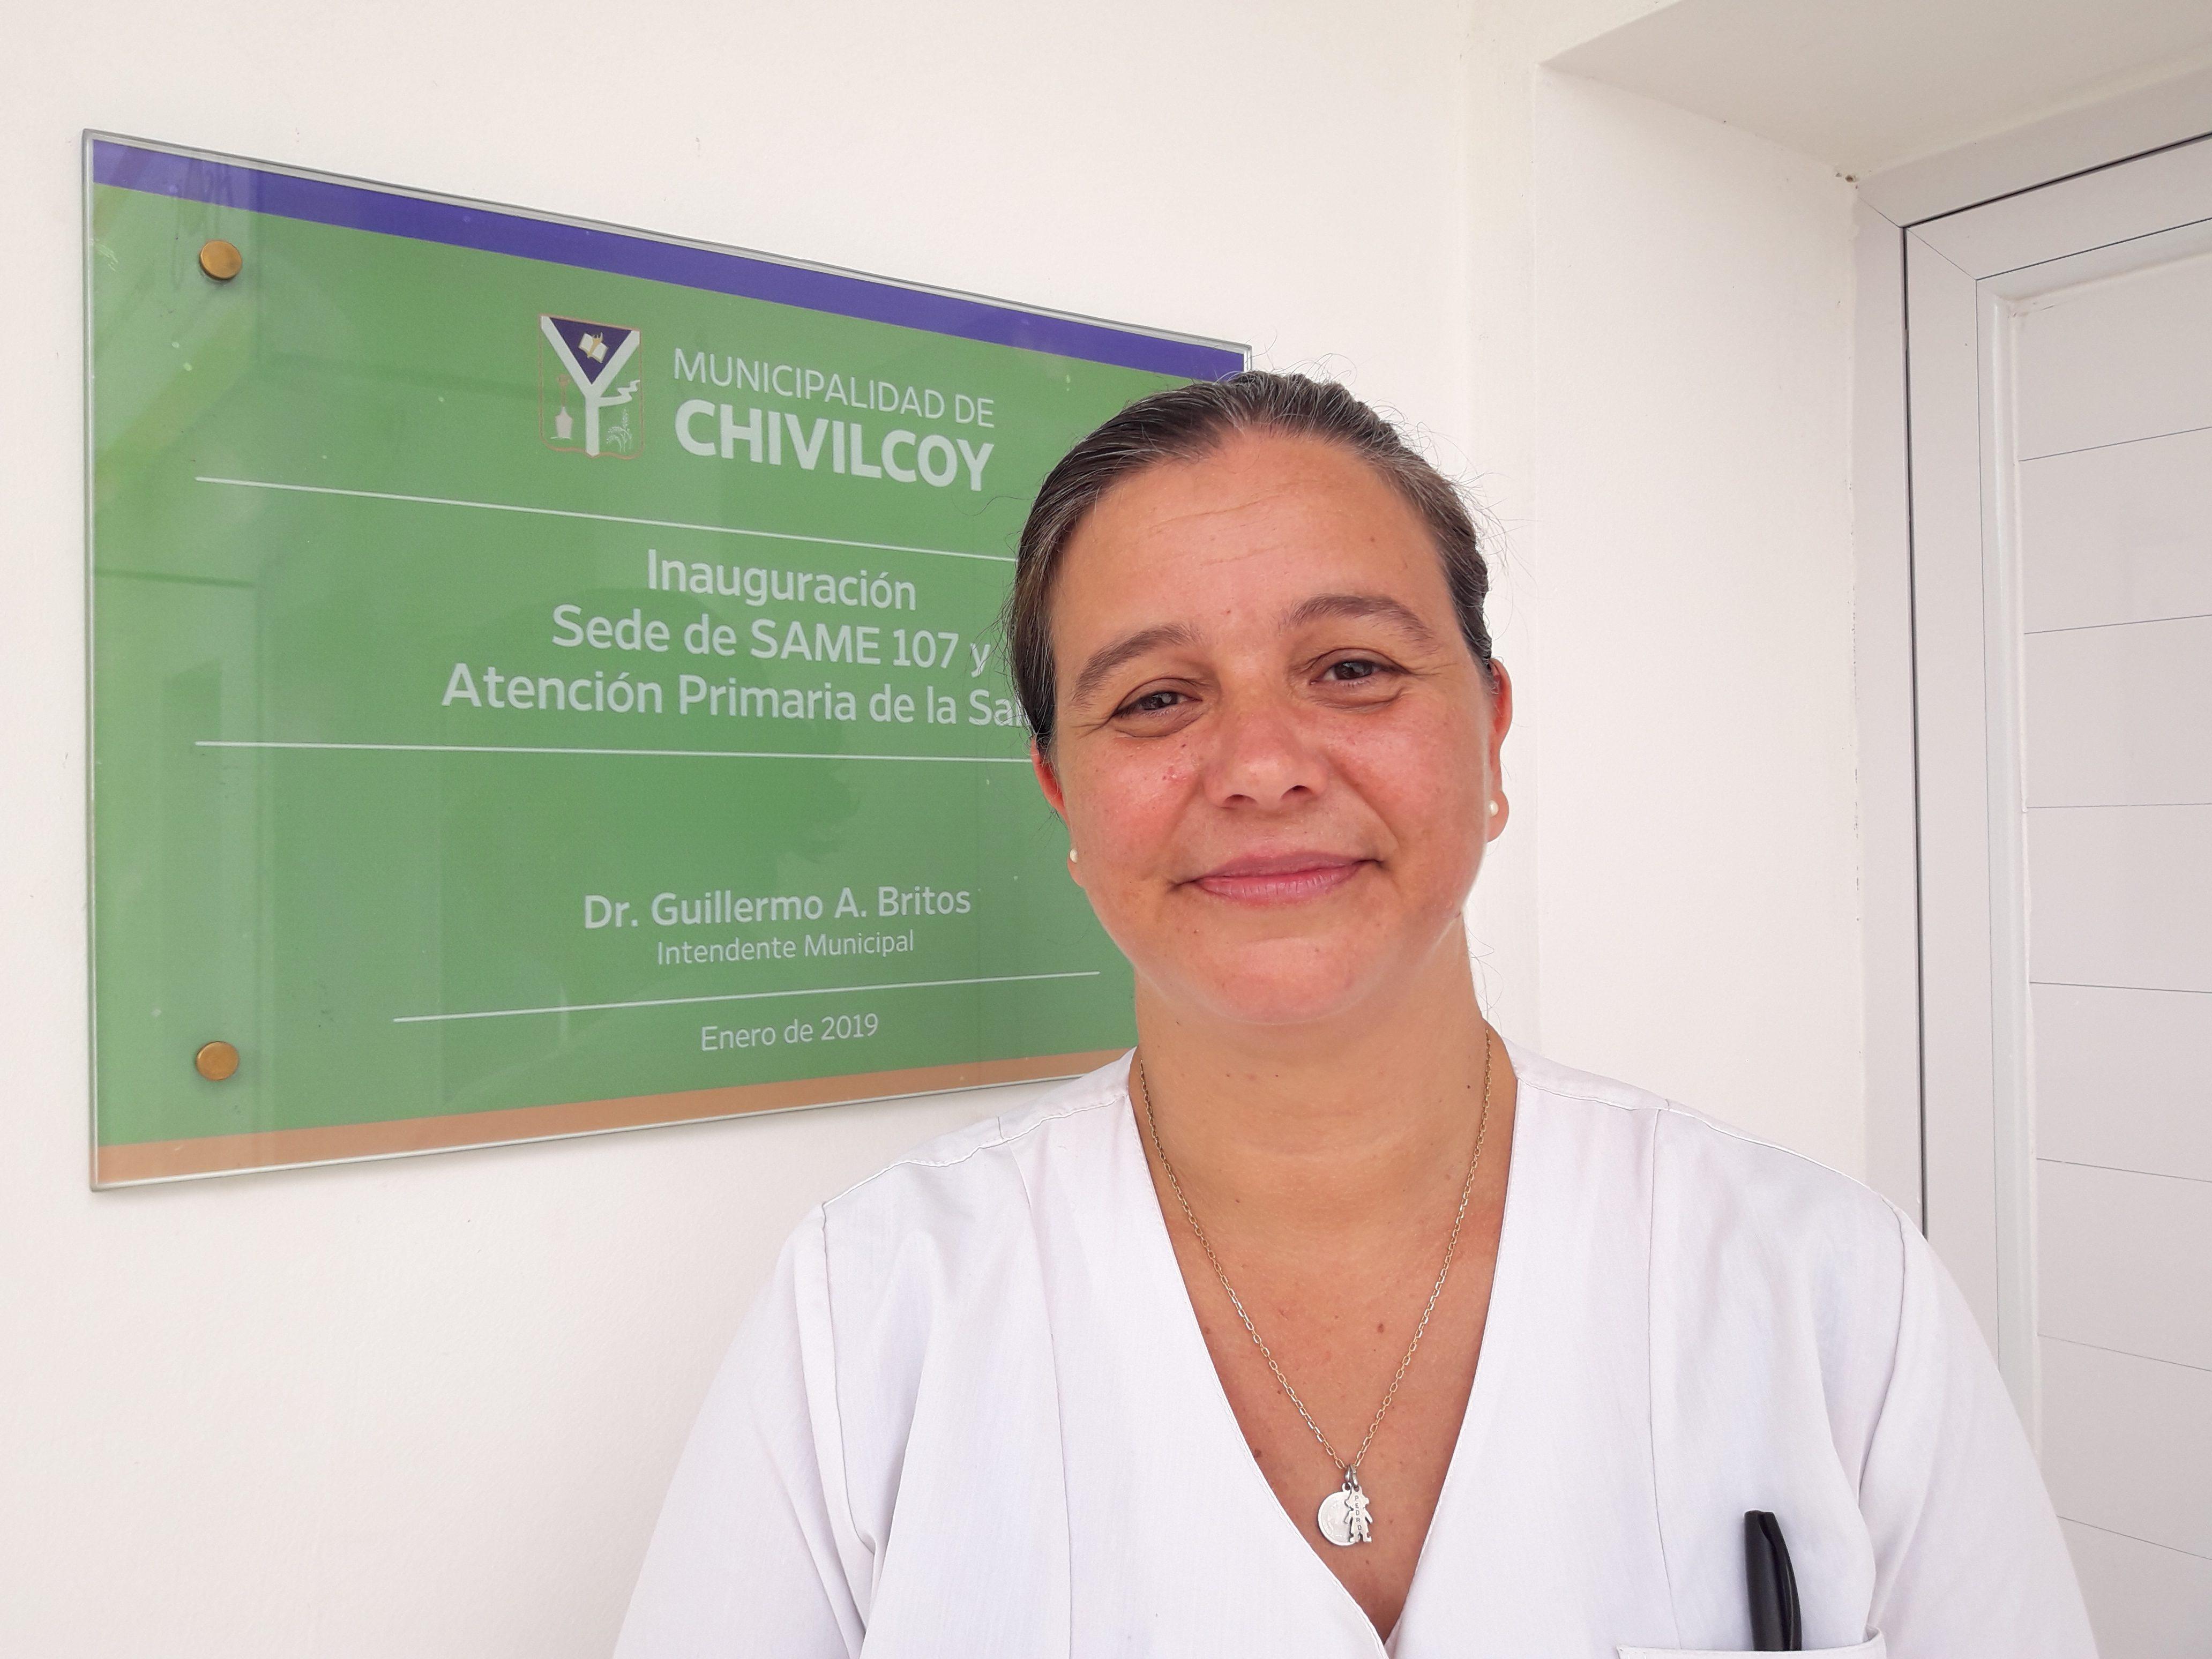 [APS Chivilcoy] 14 de Febrero: Jornada de visibilización sobre las Patologías Congénitas